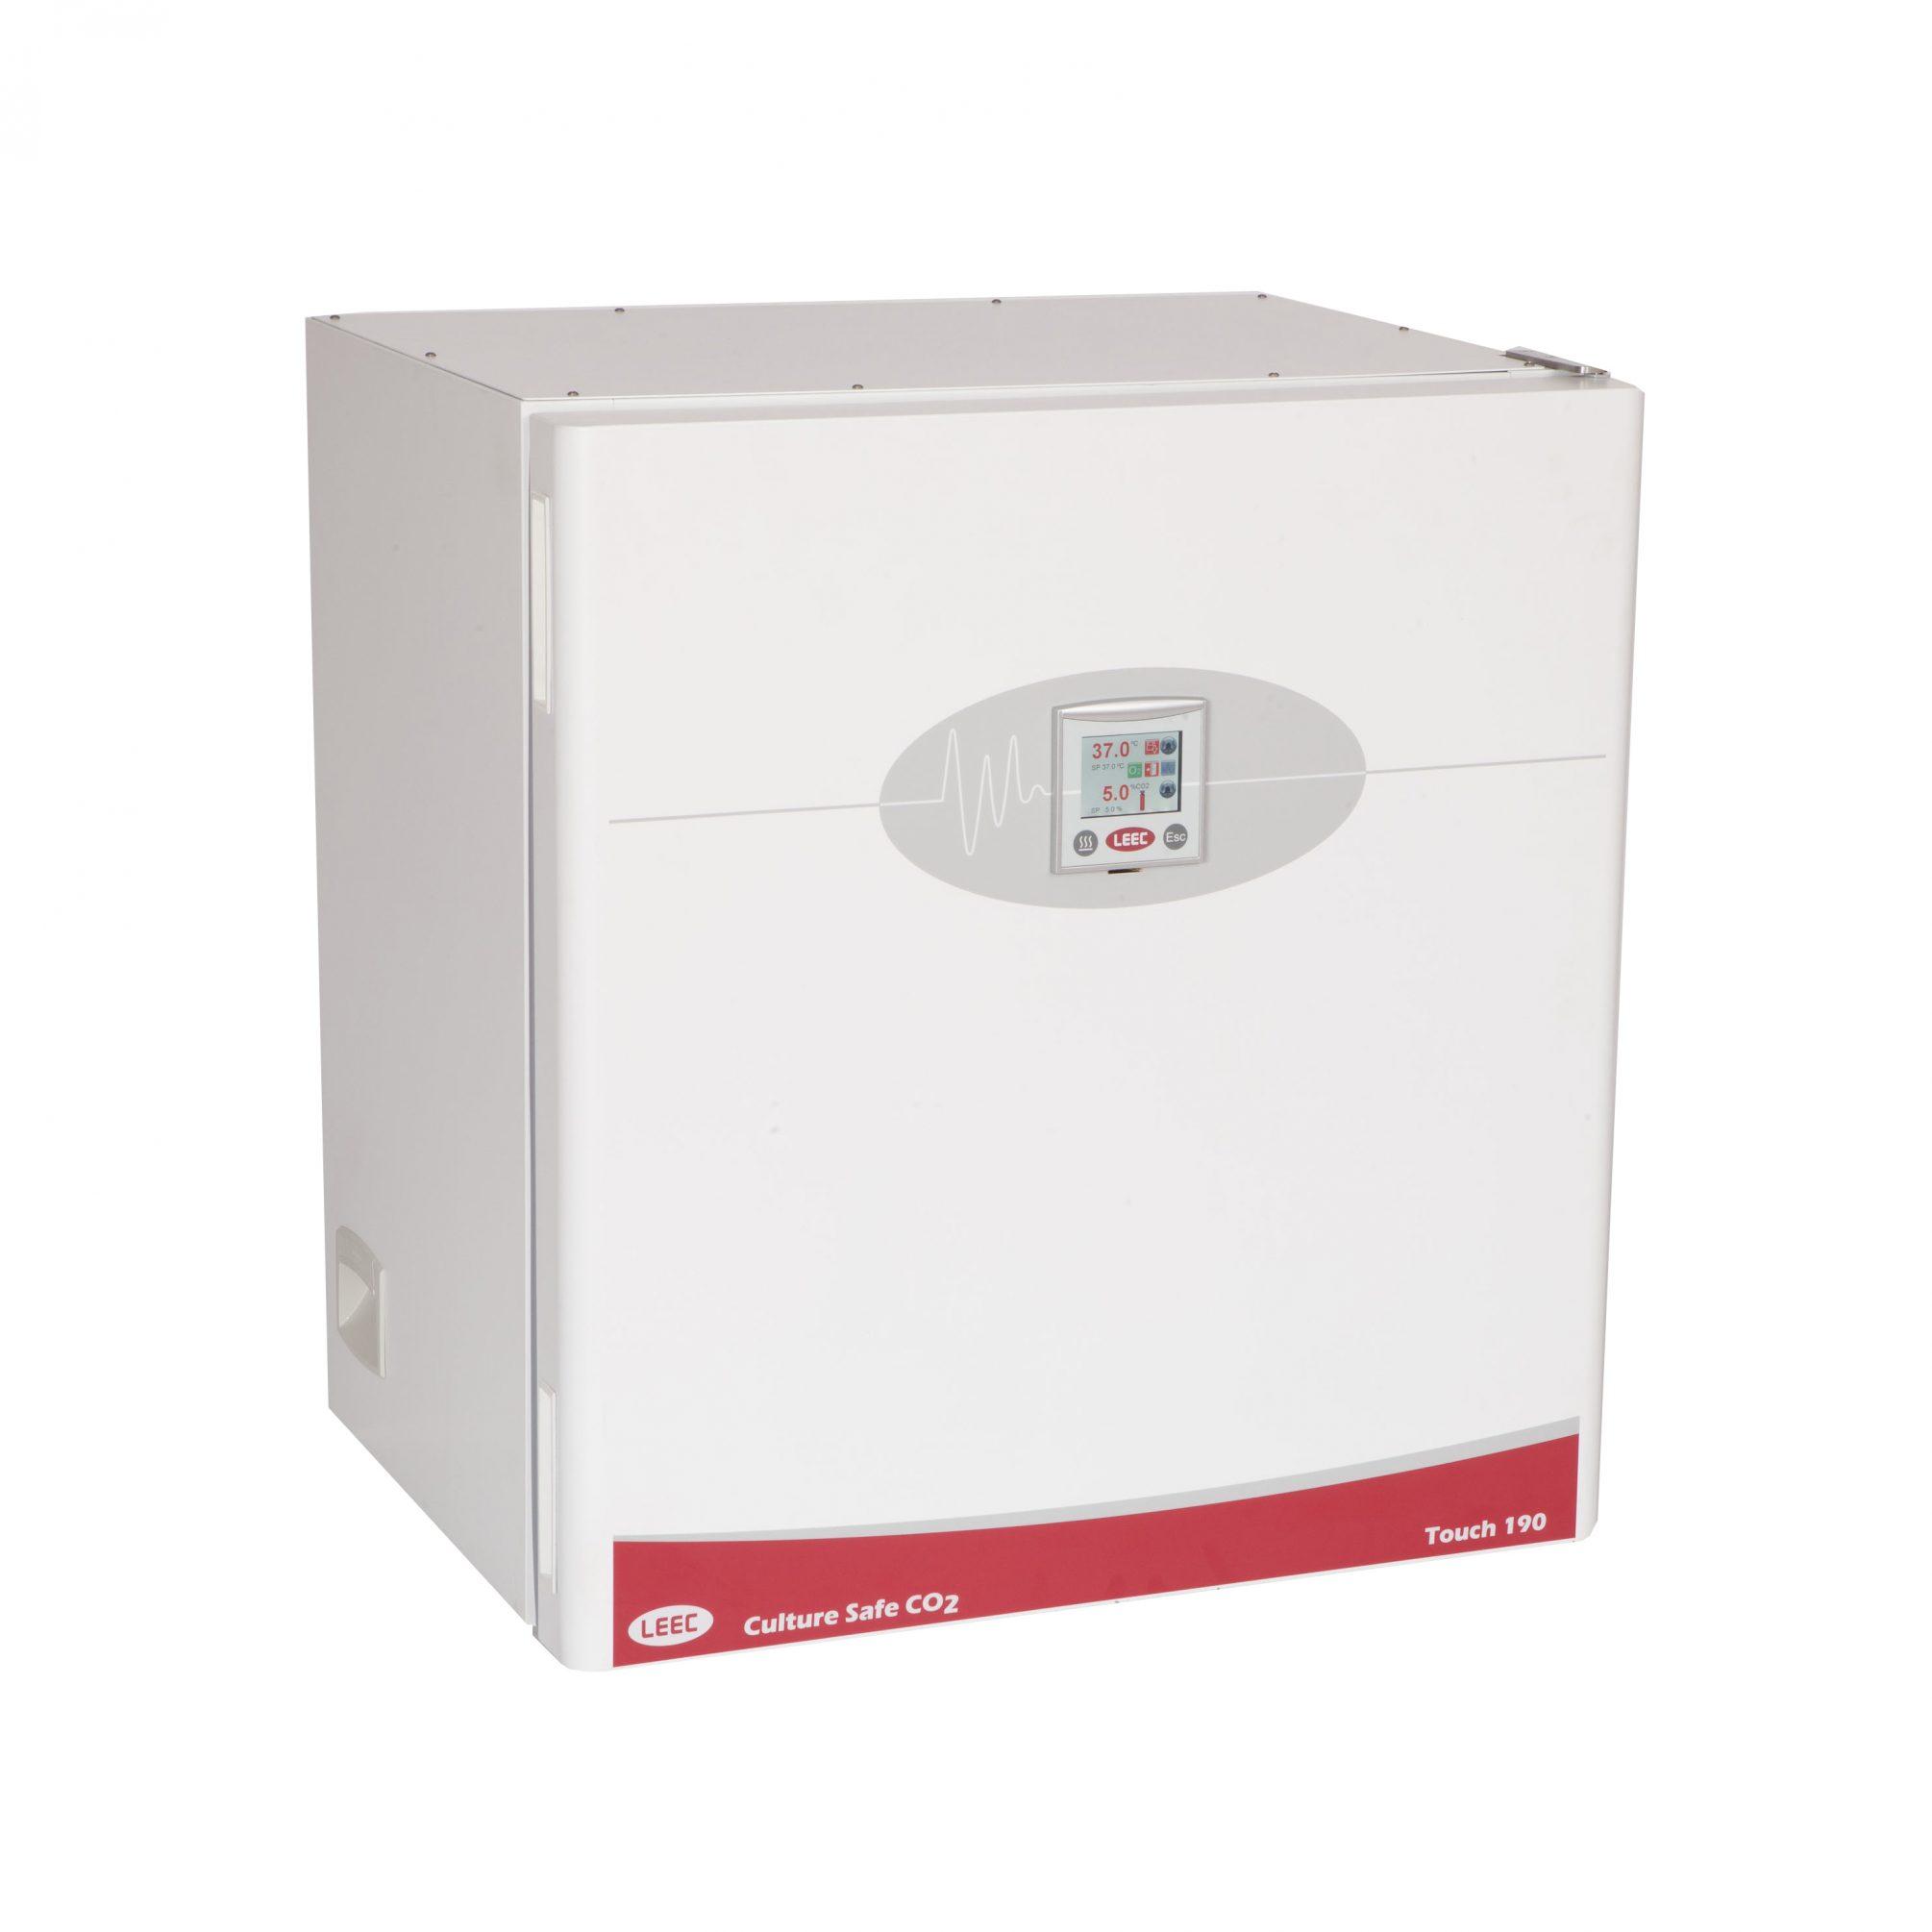 Touch 50 Culture Safe CO2 Incubator, 50L, LEEC